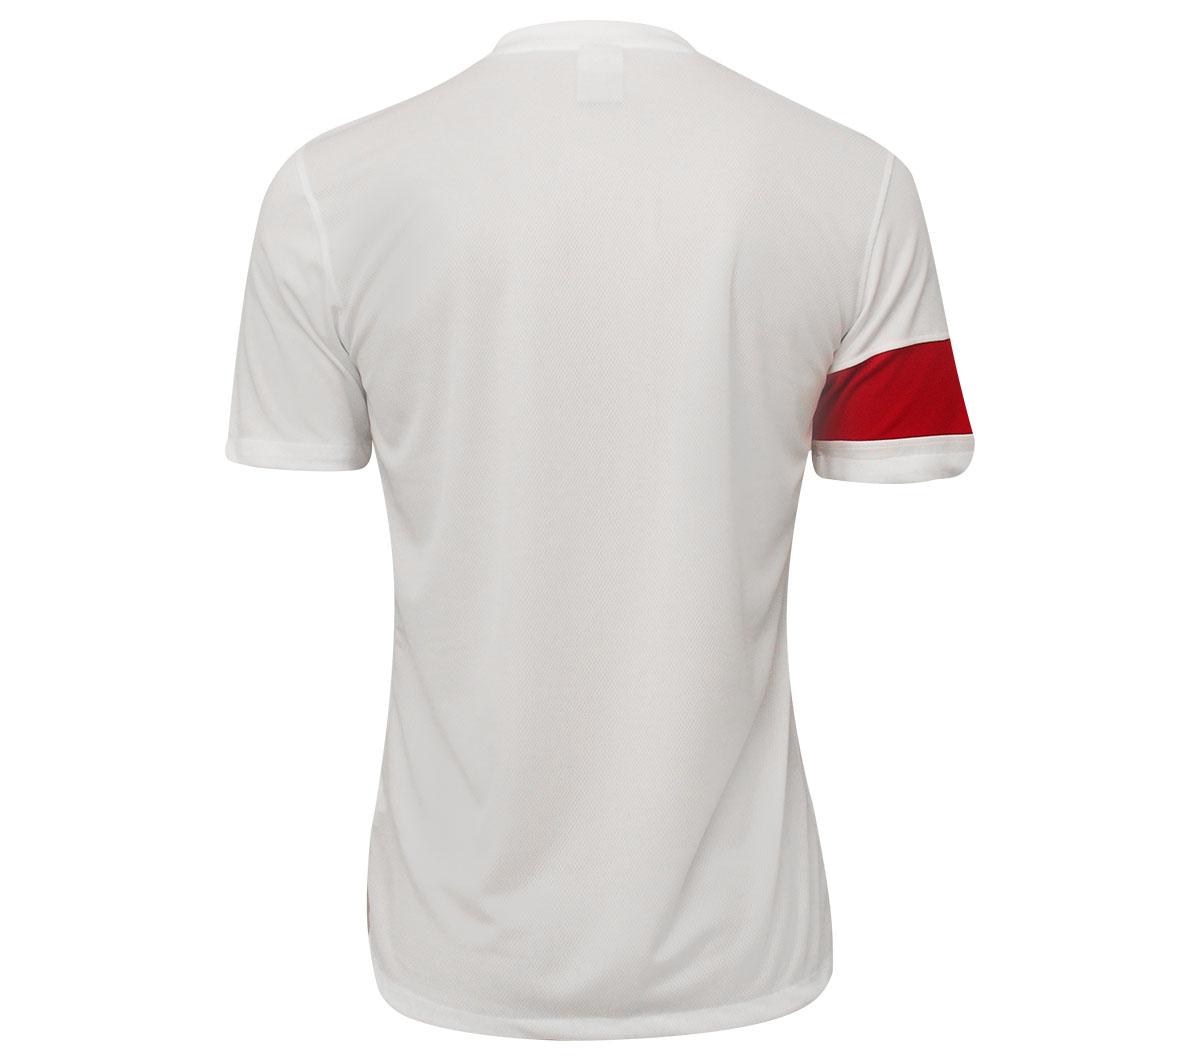 Camisa Nike SS Striker III Branca e Vermelha